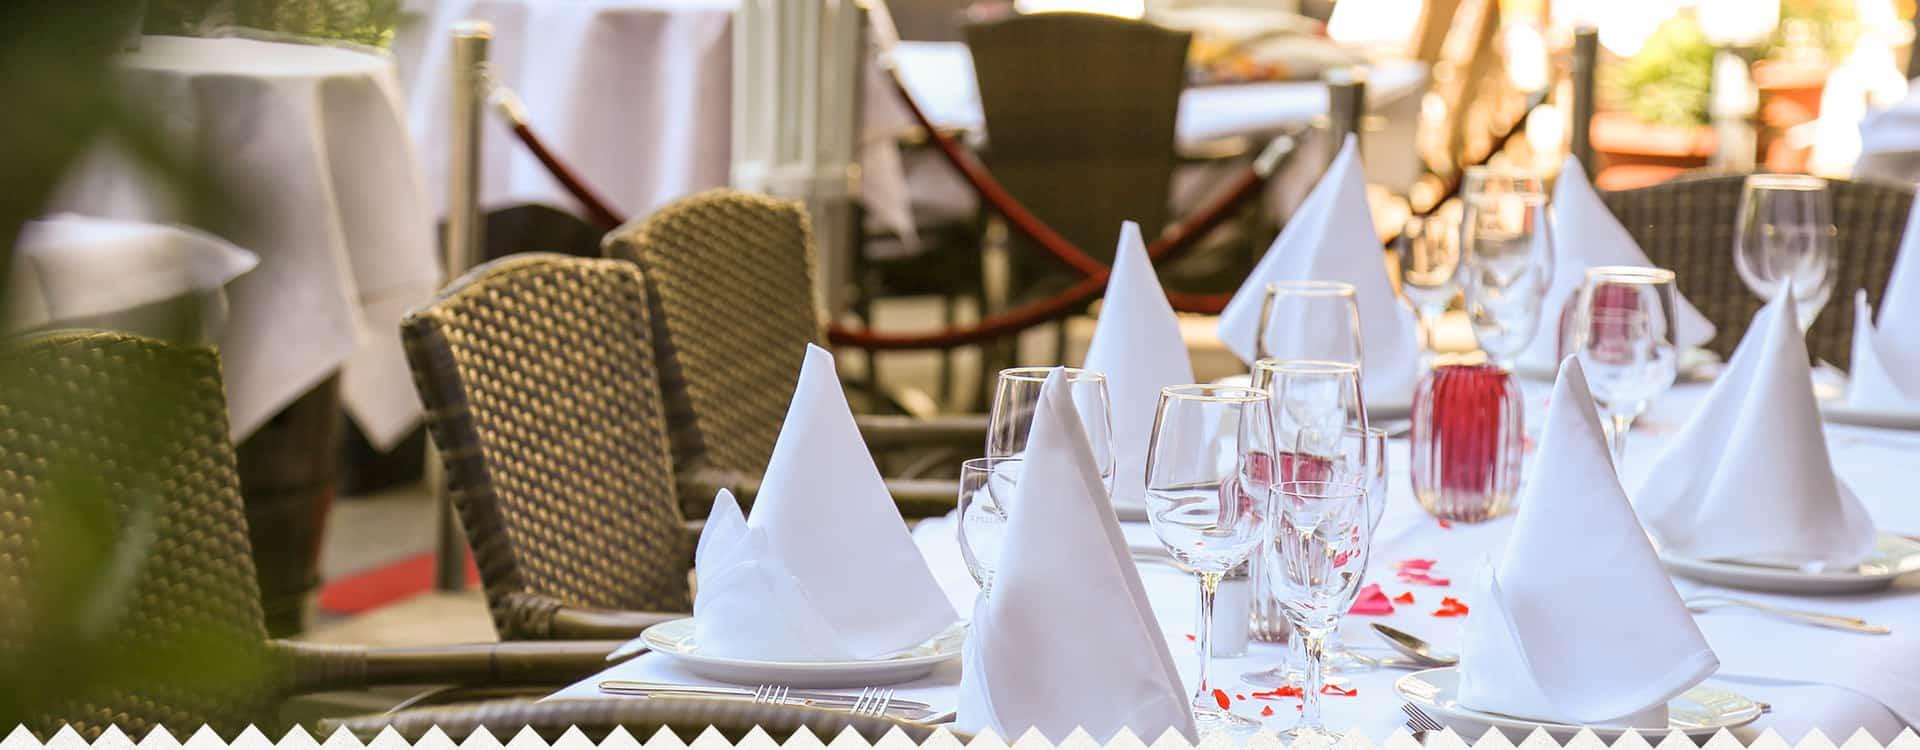 ristorante-vesuvio-berlin-slider-1920x750-5